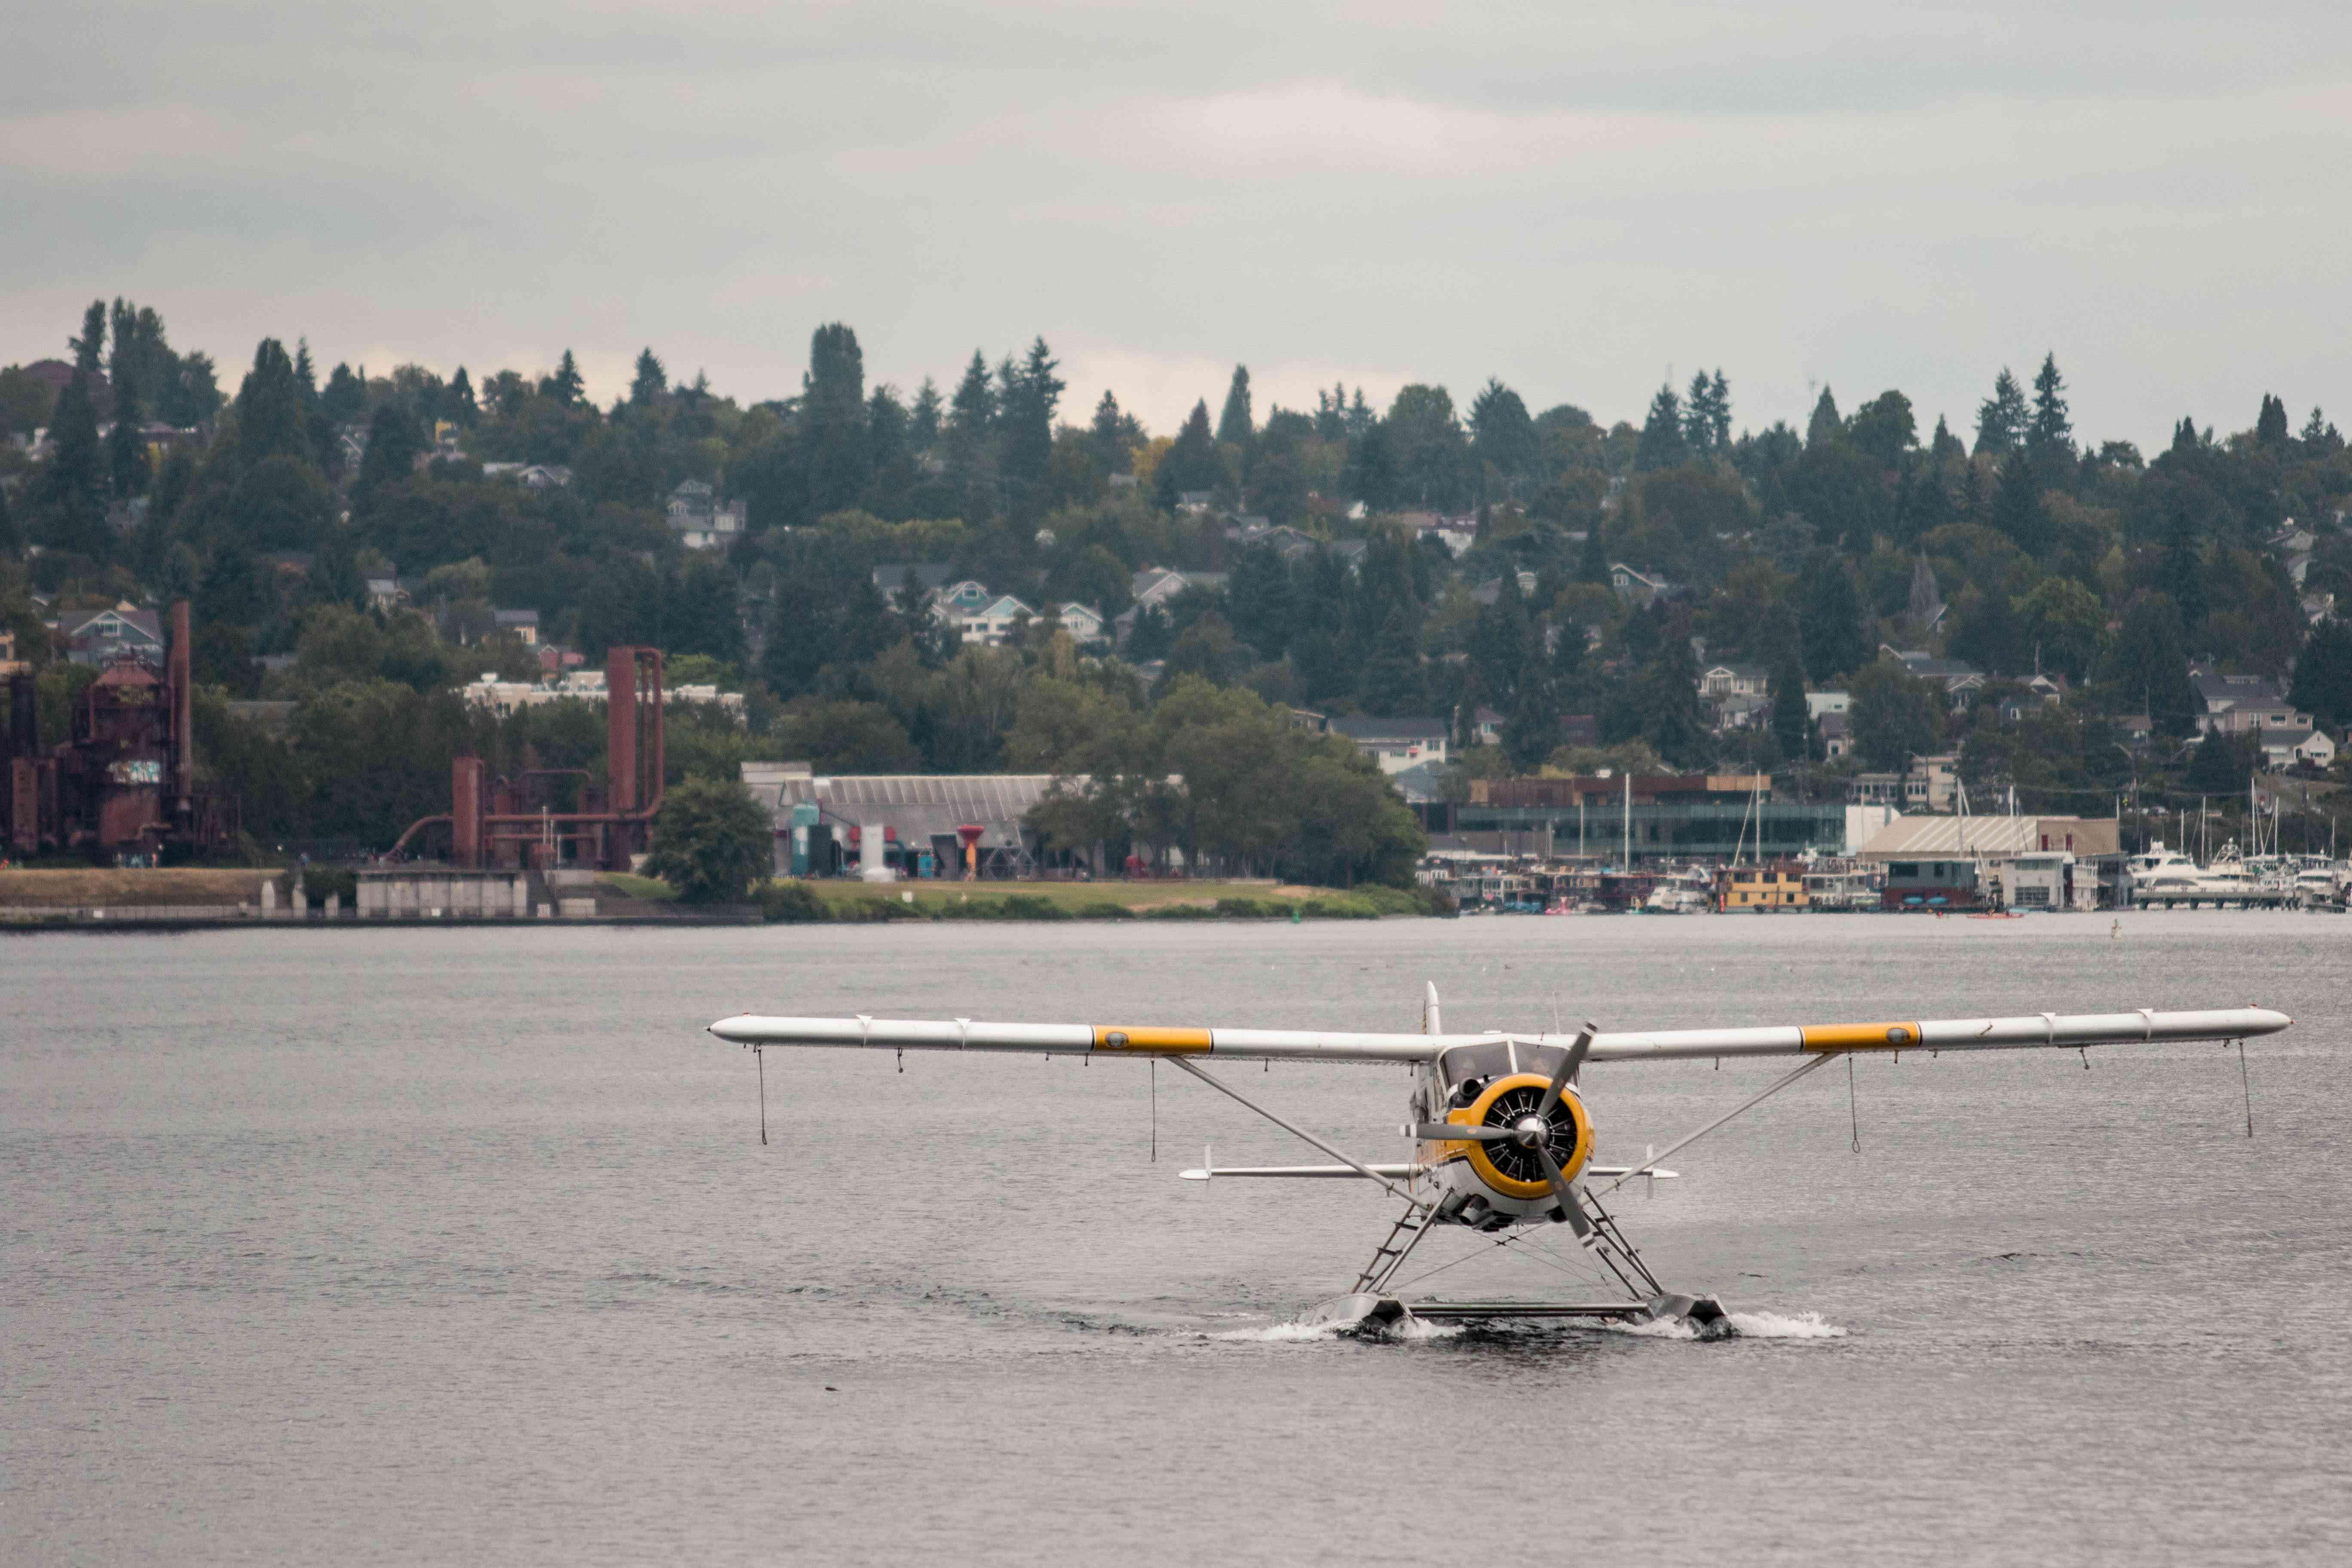 Kenmore Air seaplane in Seattle, Washington